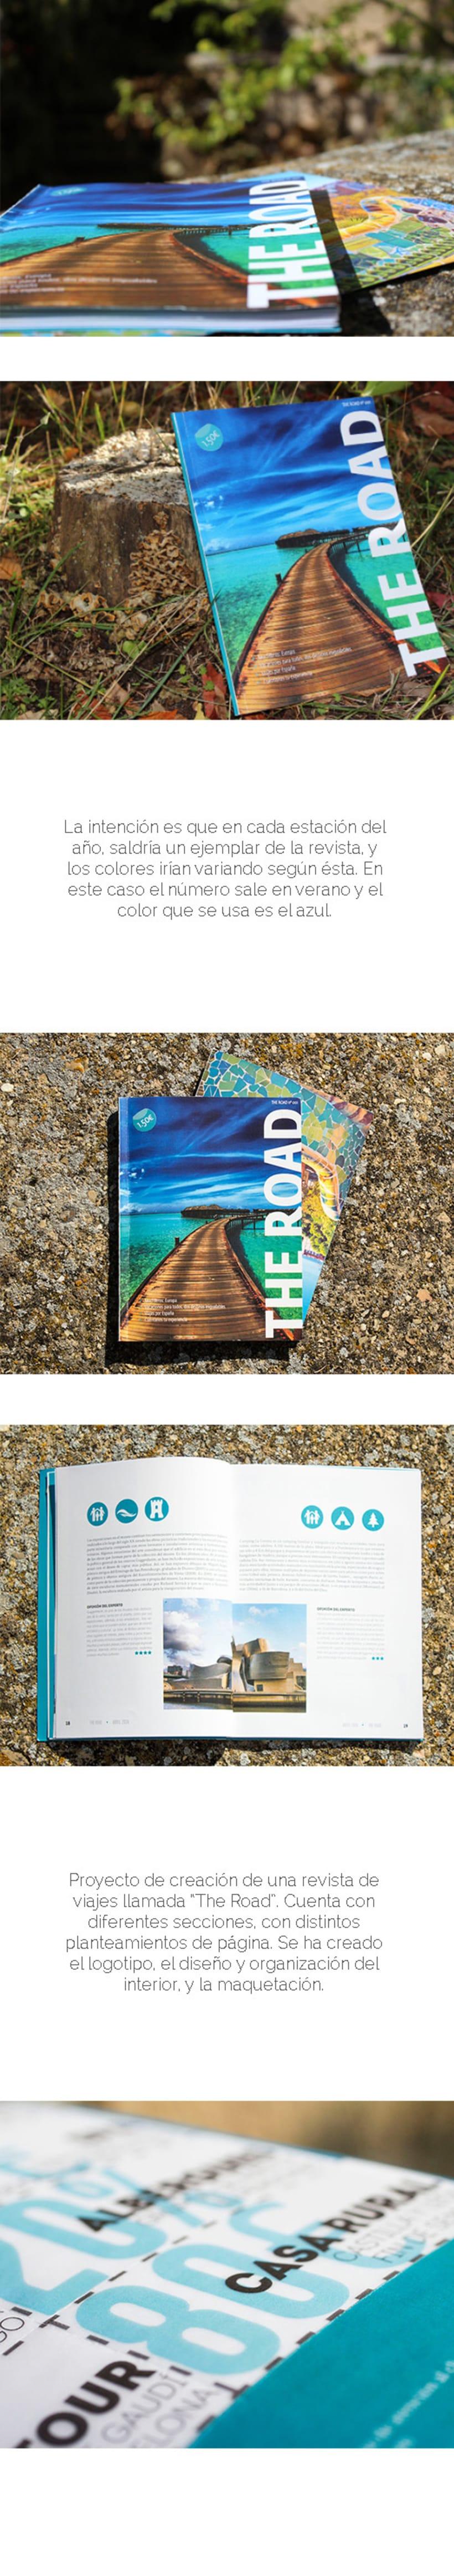 Diseño editorial - The road 0